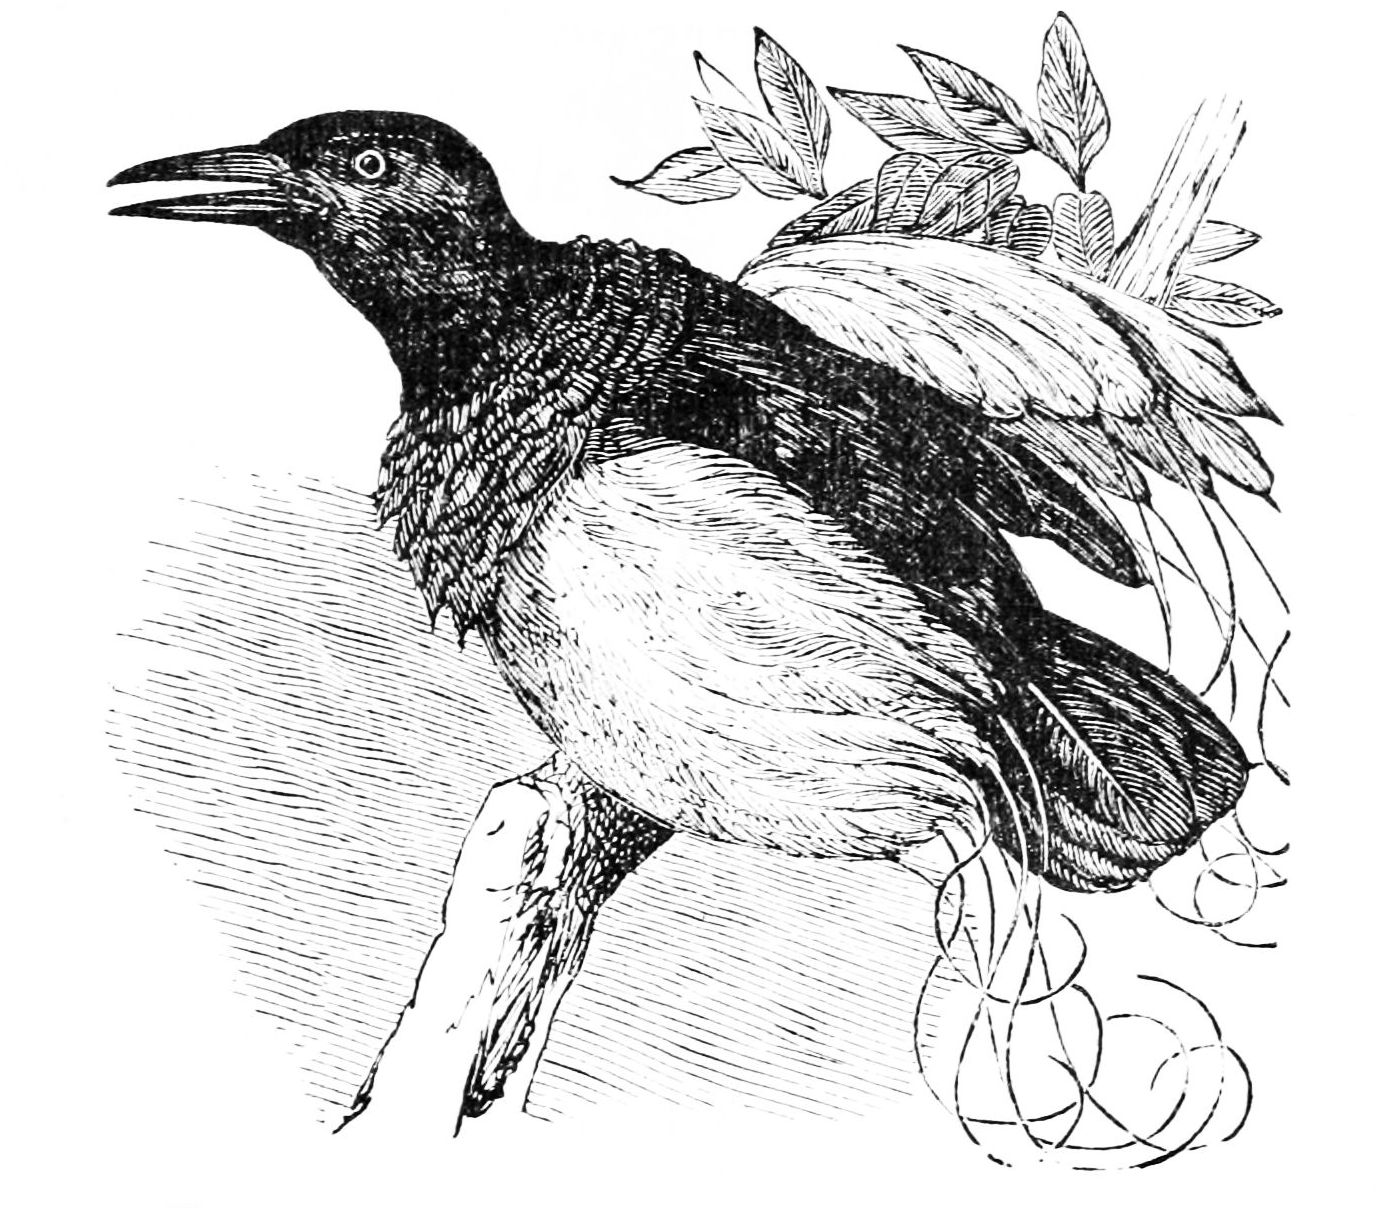 File:PSM V05 D585 Twelve wired paradise bird.jpg - Wikimedia Commons